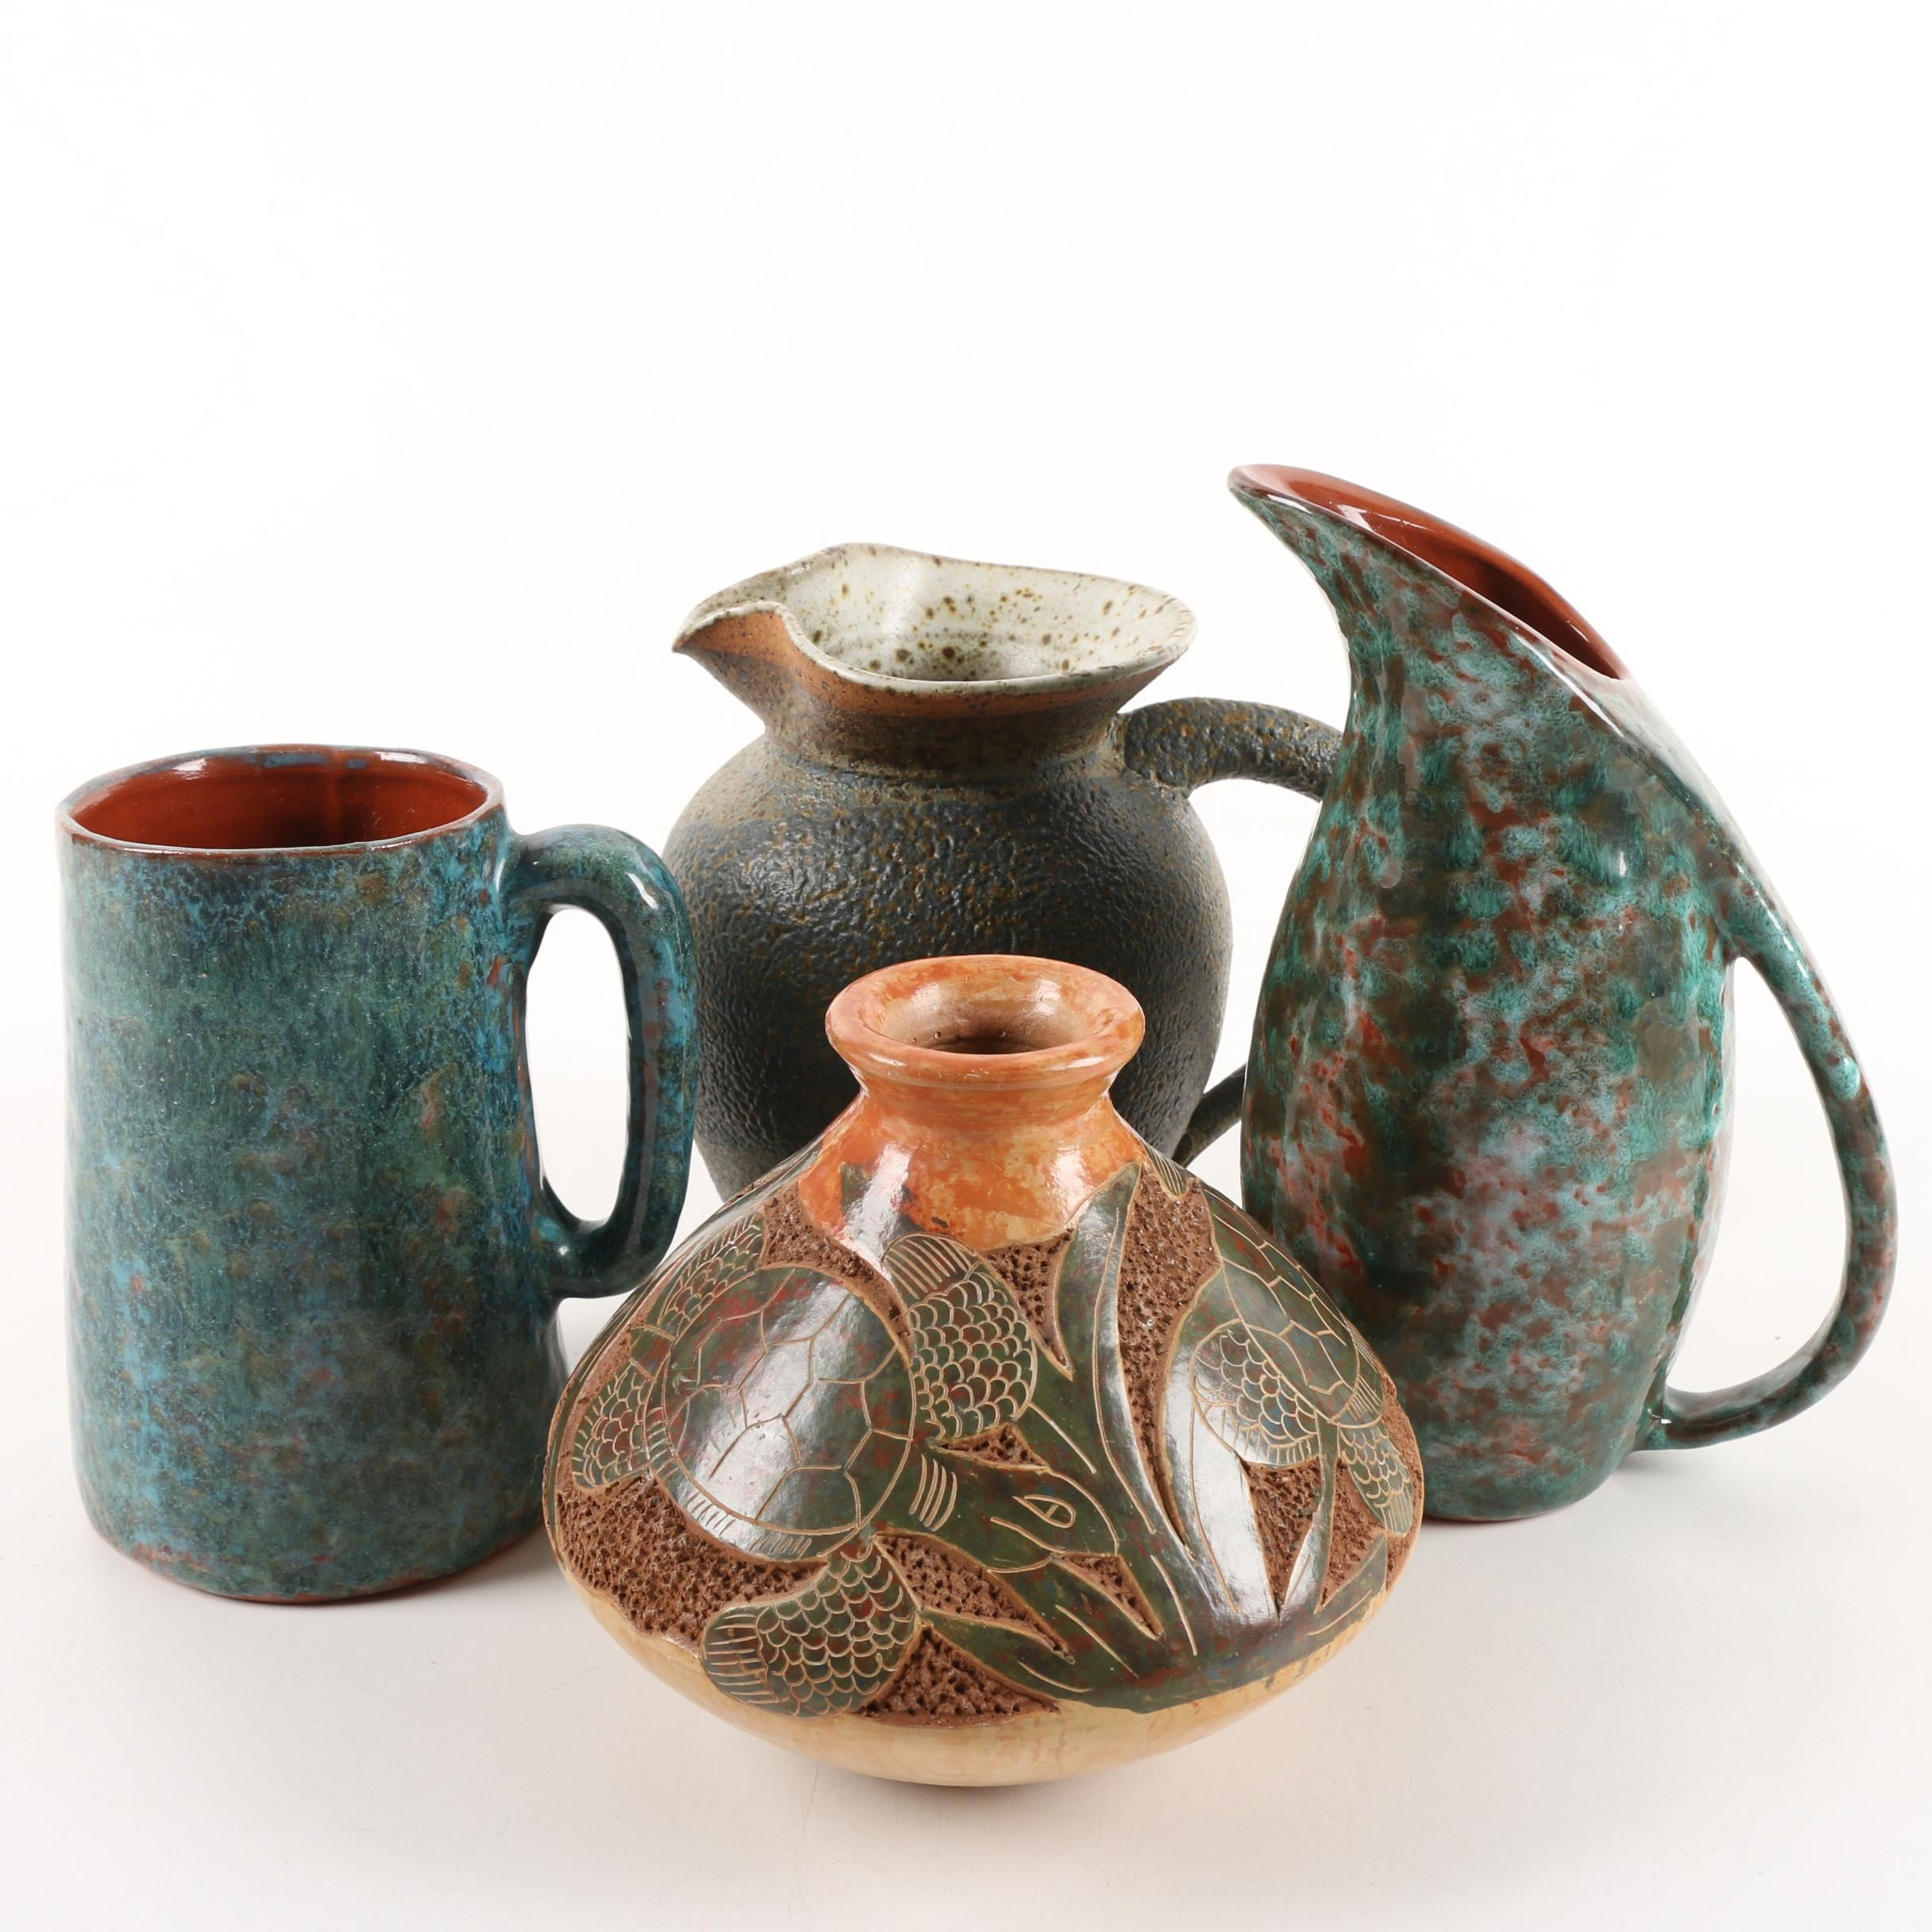 Functional Art Pottery Vessels including Prince Edward Island Burlington